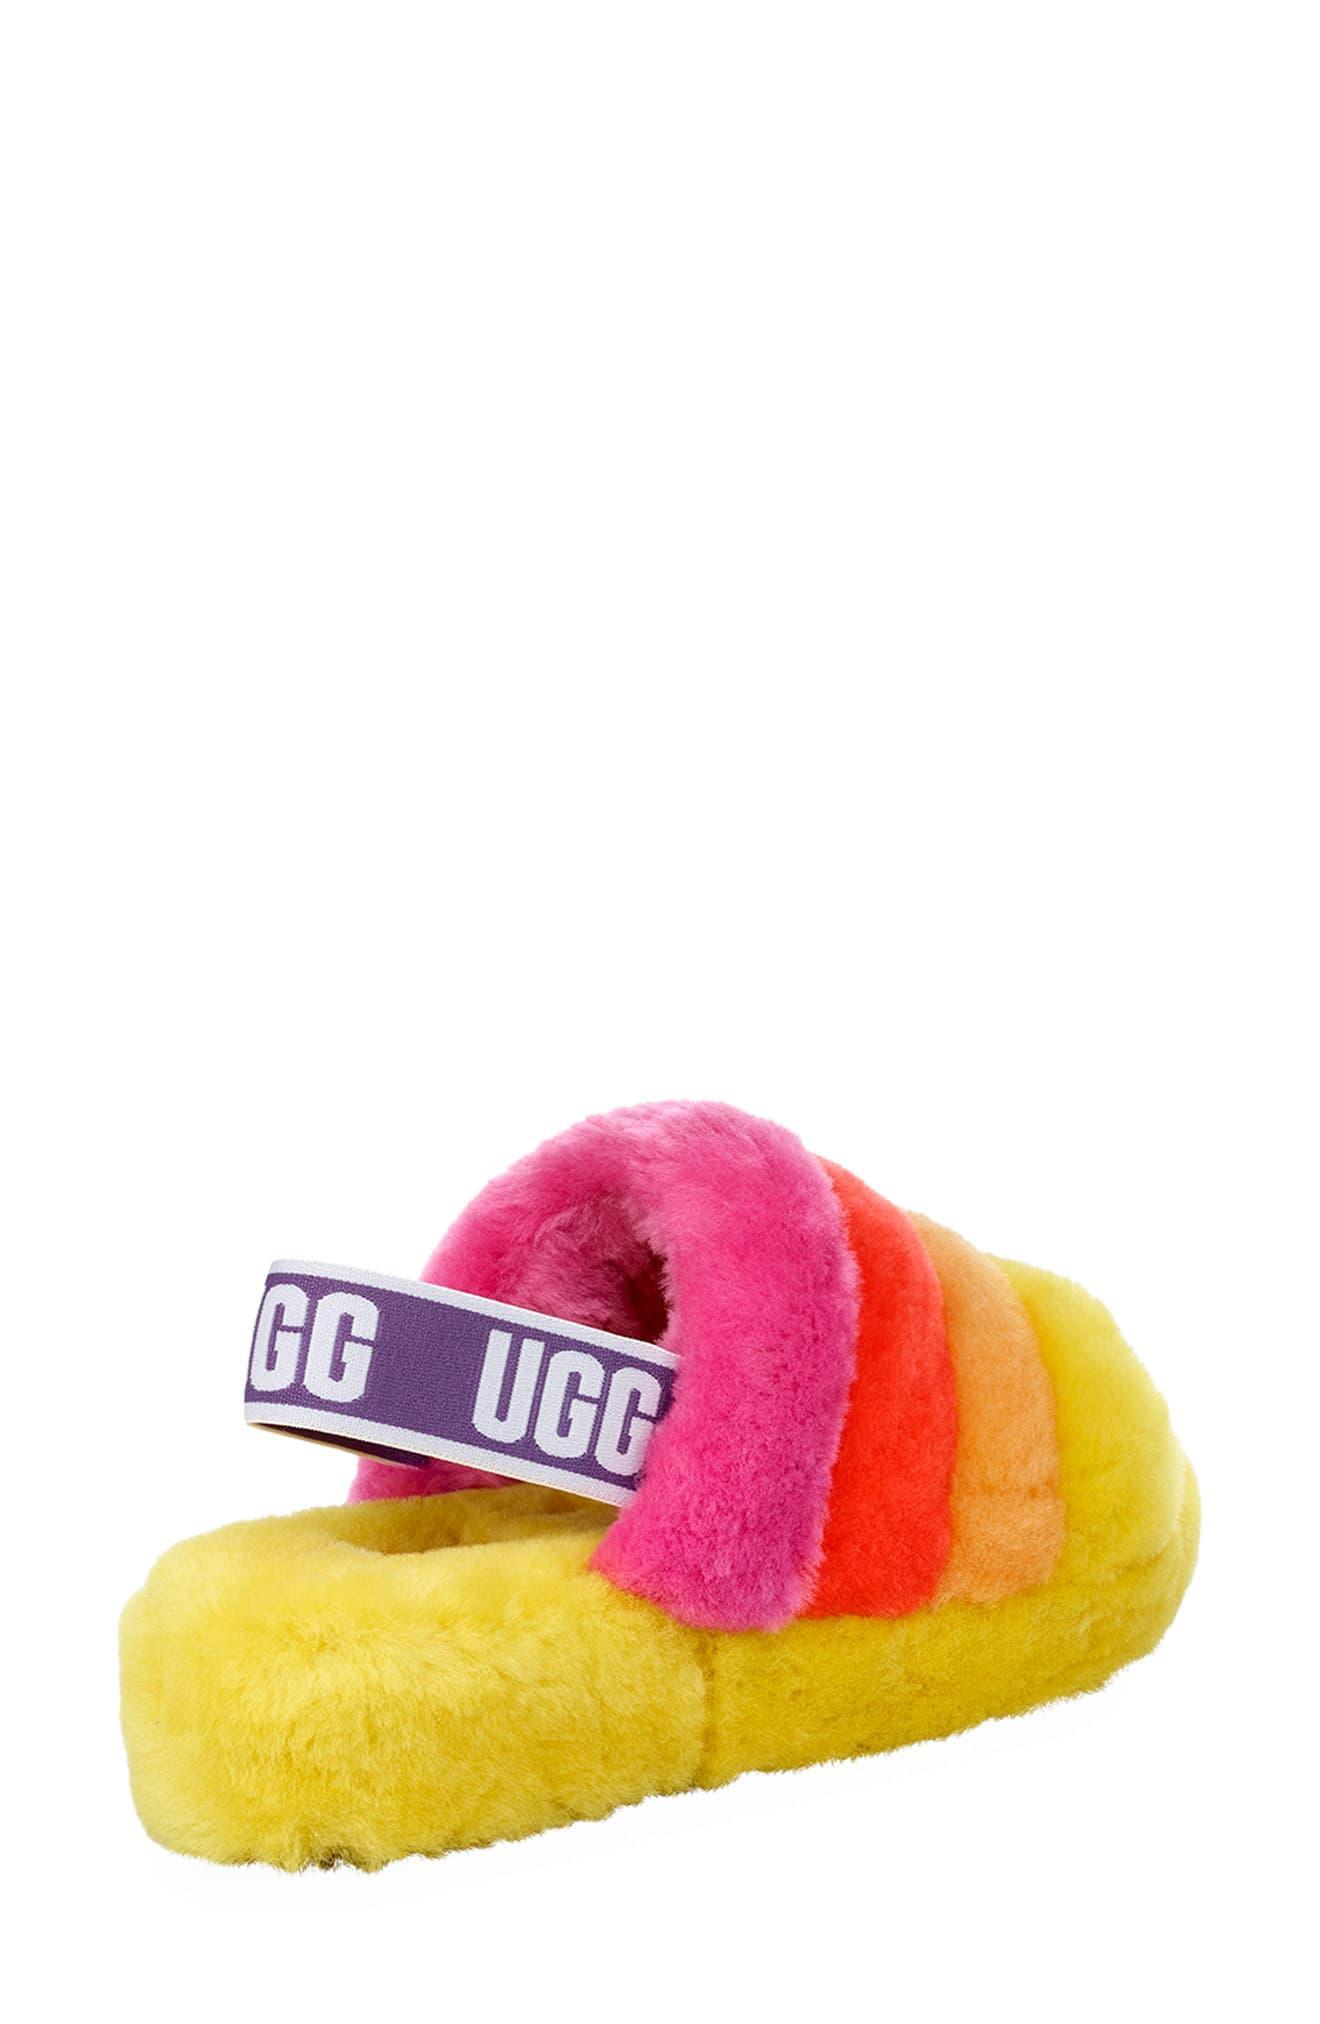 20b40cd0323 Ugg Pink Fluff Yeah Pride Slide